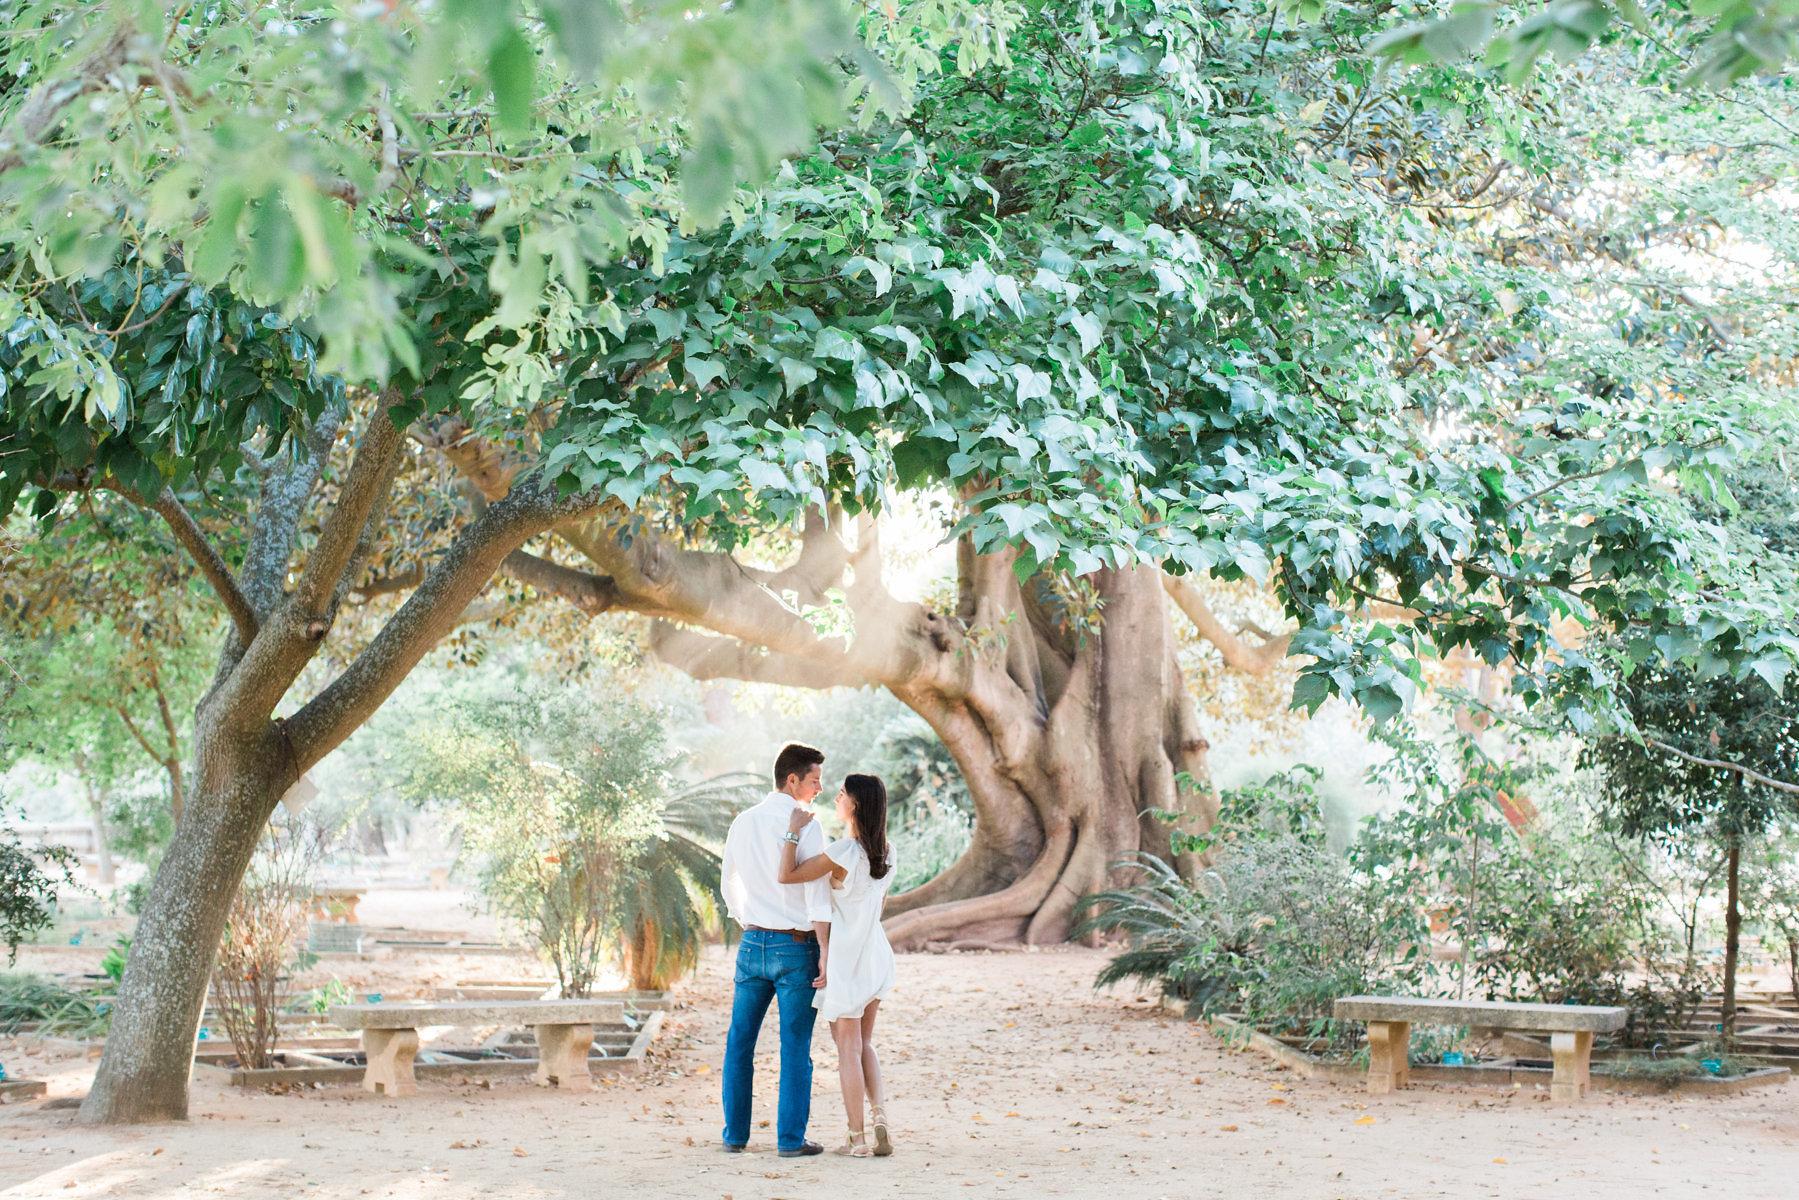 engagement-session-estufa-real-jardim-botanico-ajuda-mariaraophotography-122web.jpg